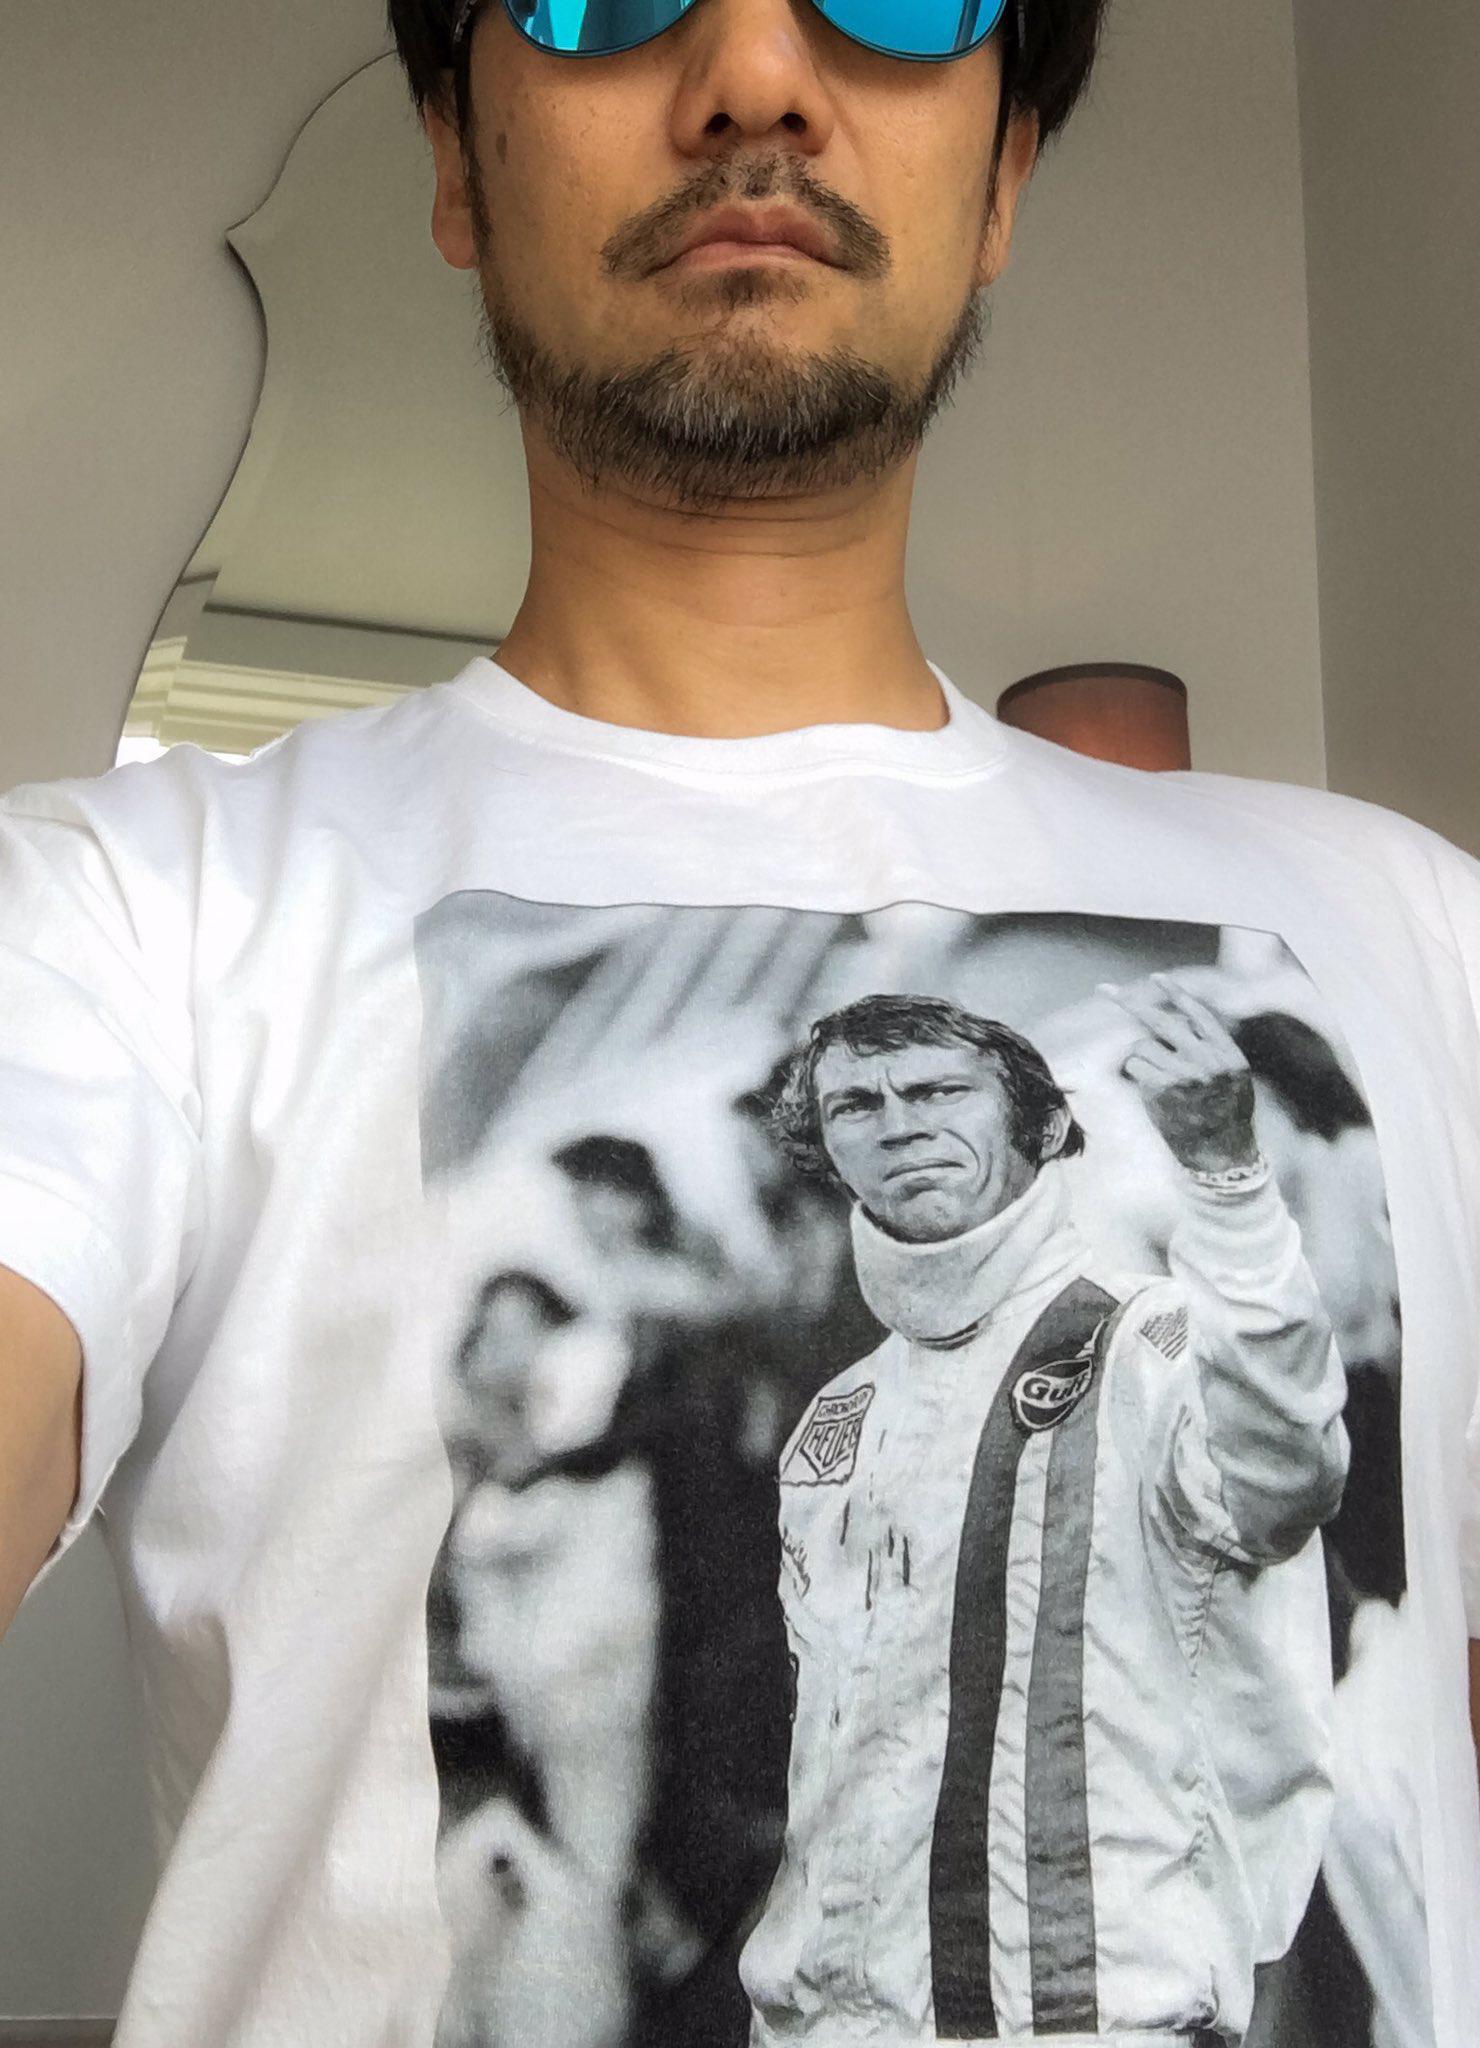 Hideo-Kojima-Steve-McQueen-Shirt